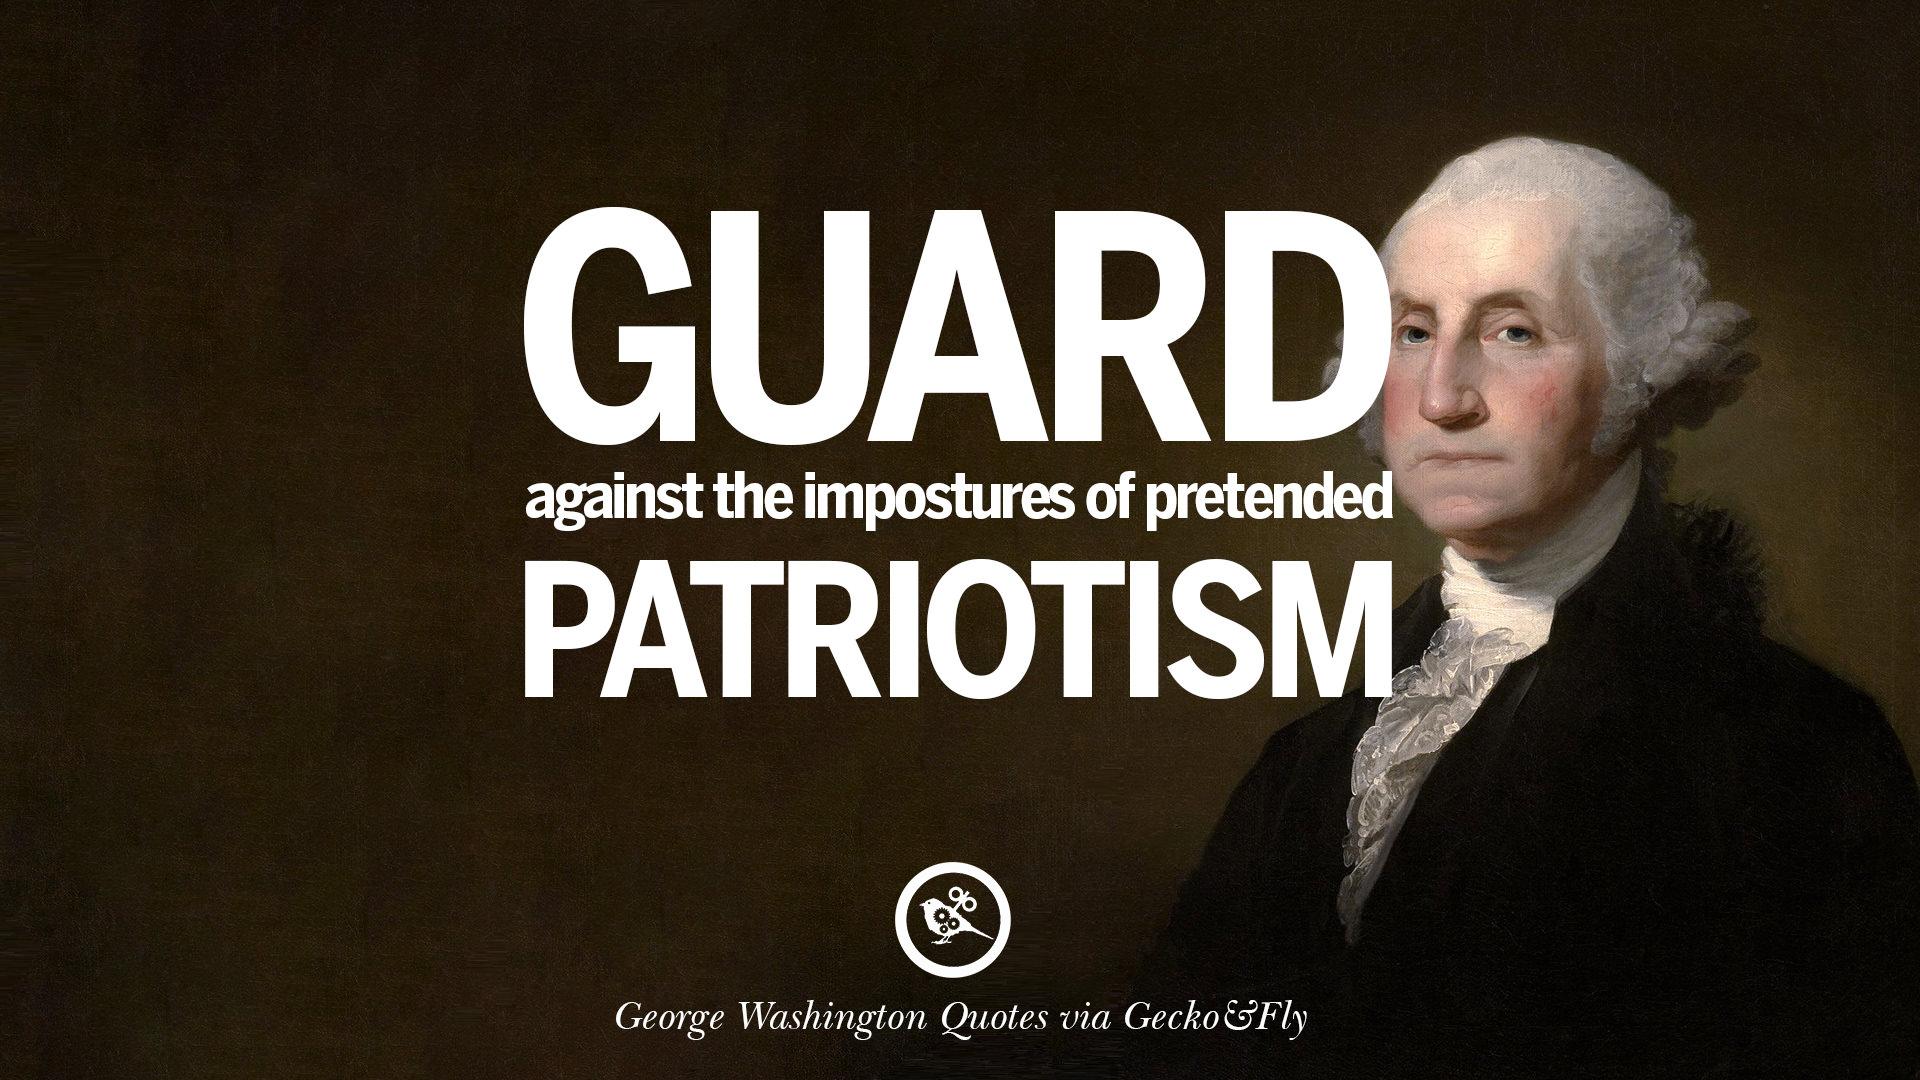 George Washington Famous Quotes During American Revolution: 20 Famous George Washington Quotes On Freedom, Faith